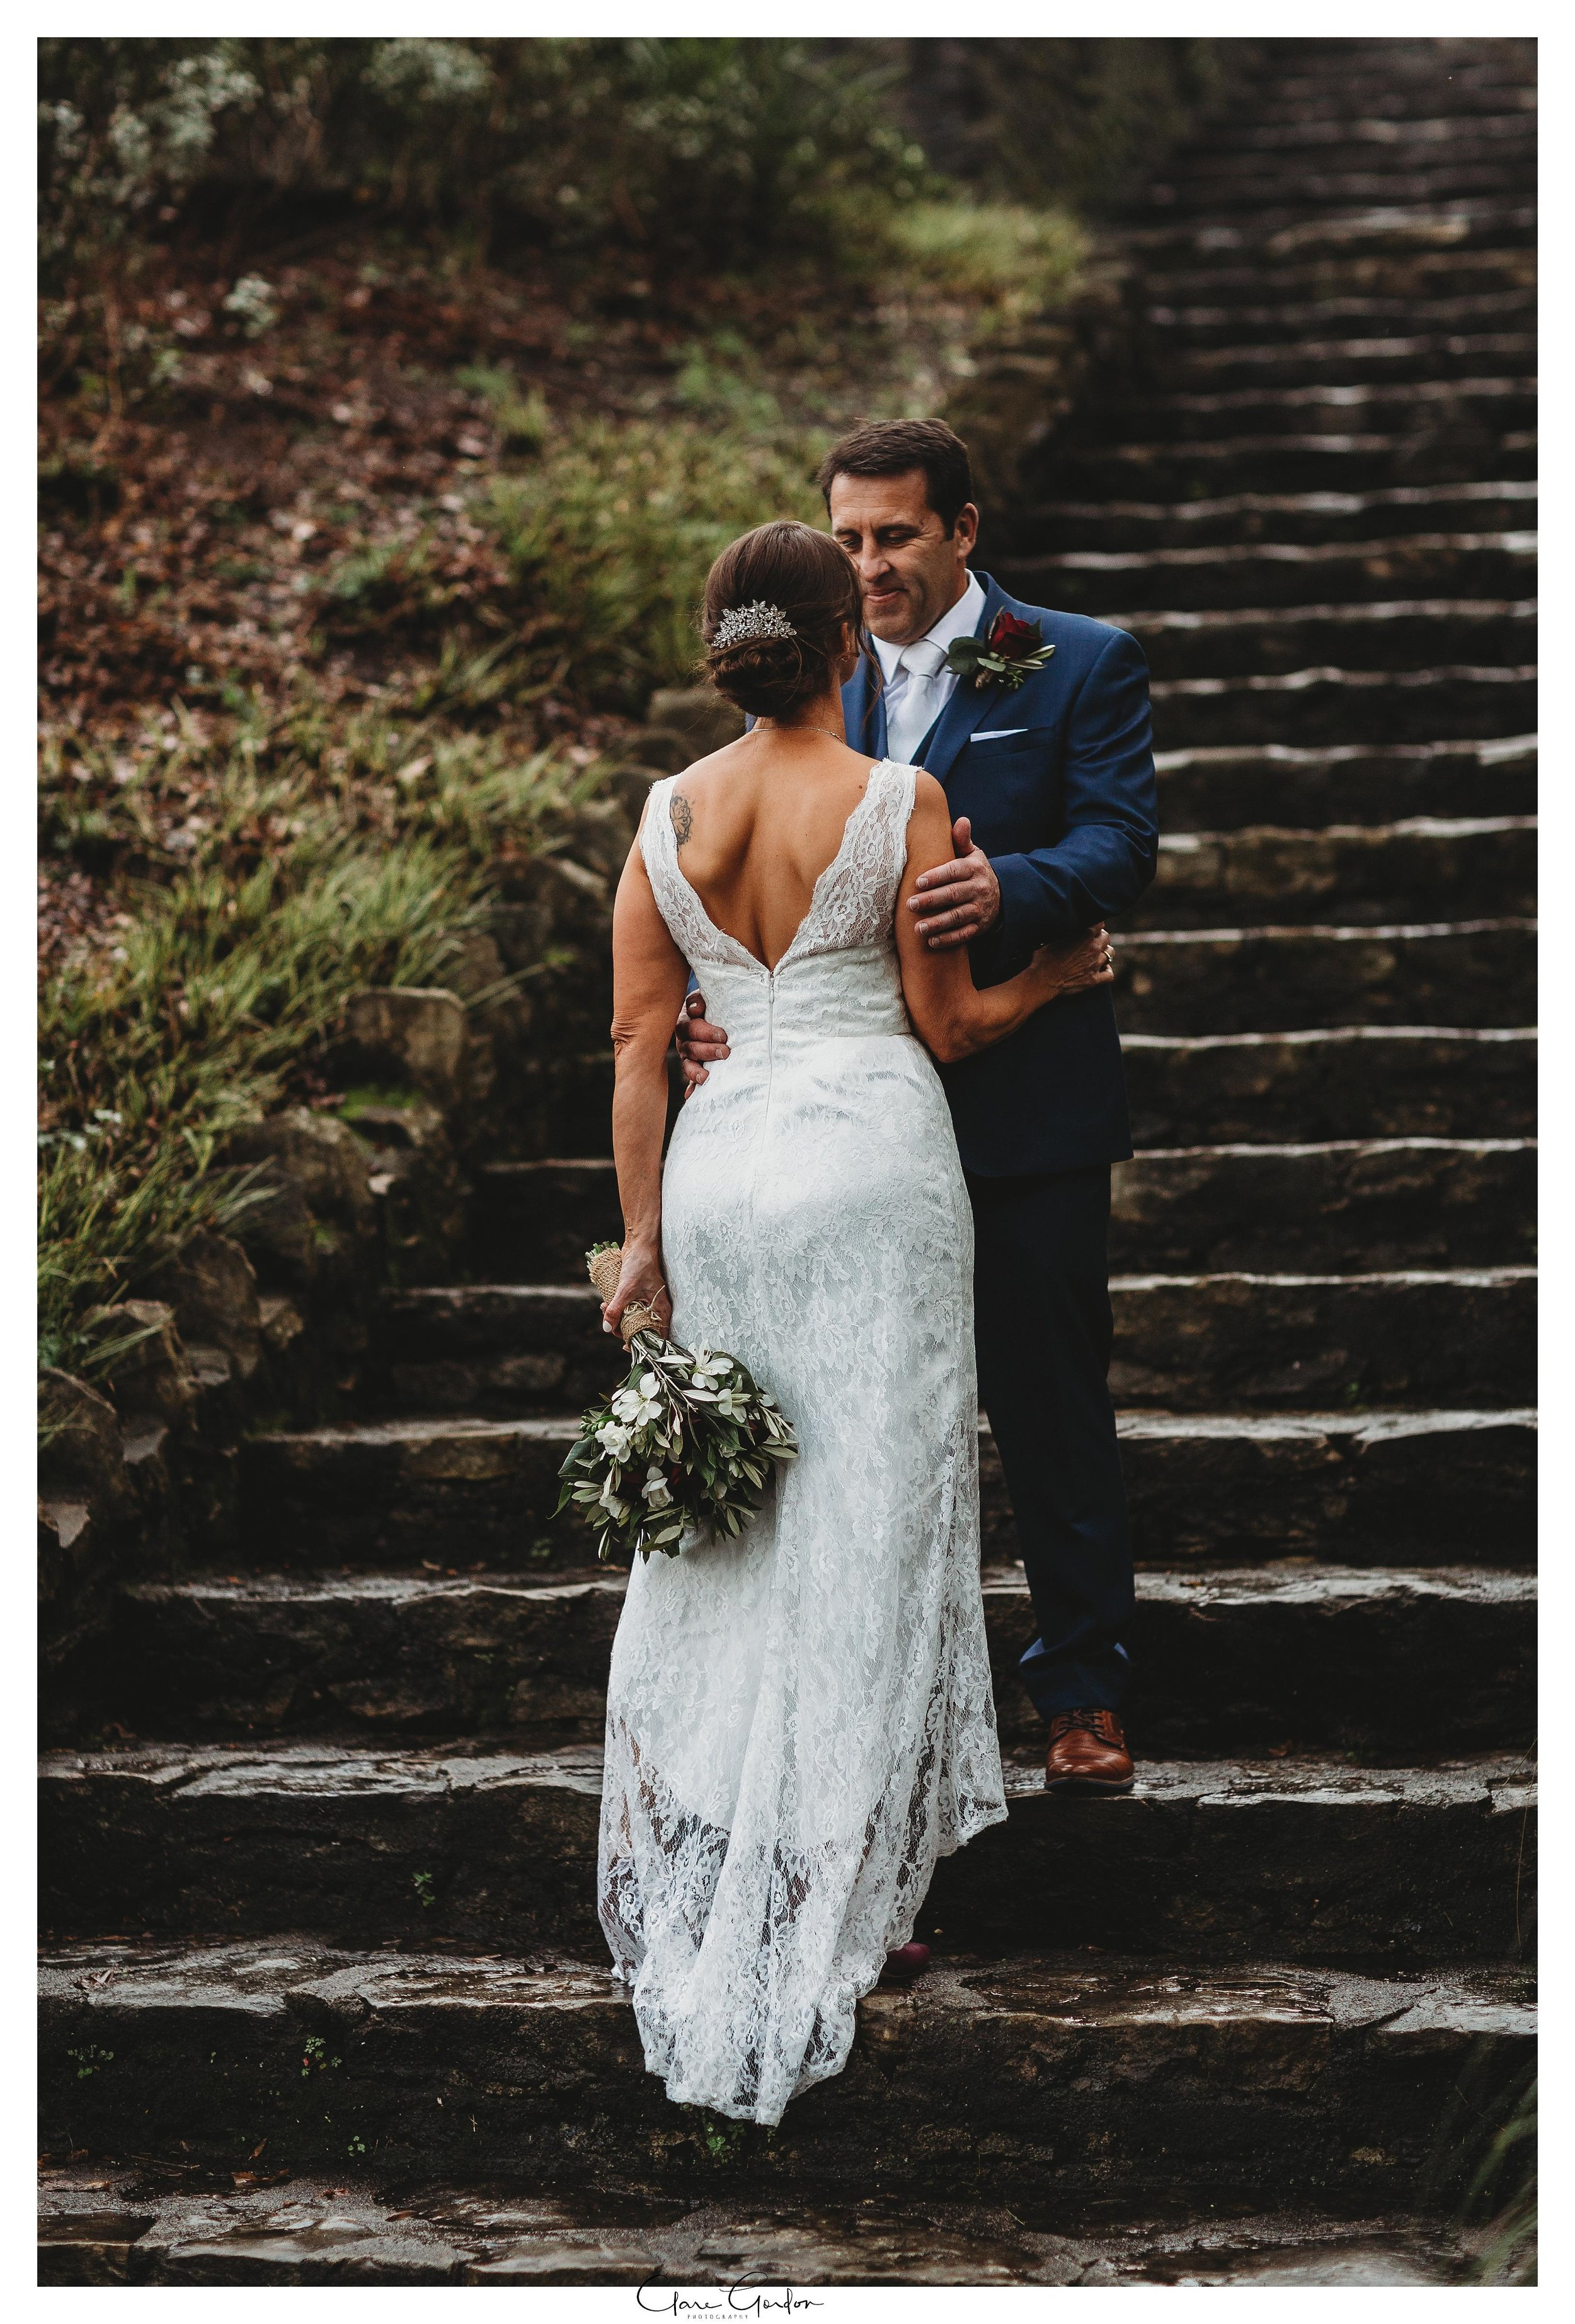 Hamilton-NZ-wedding-photographer-Bride-reflection-Waikato-wedding-photographer-Novotel-Hamilton-Clare-Gordon-photography (25).jpg